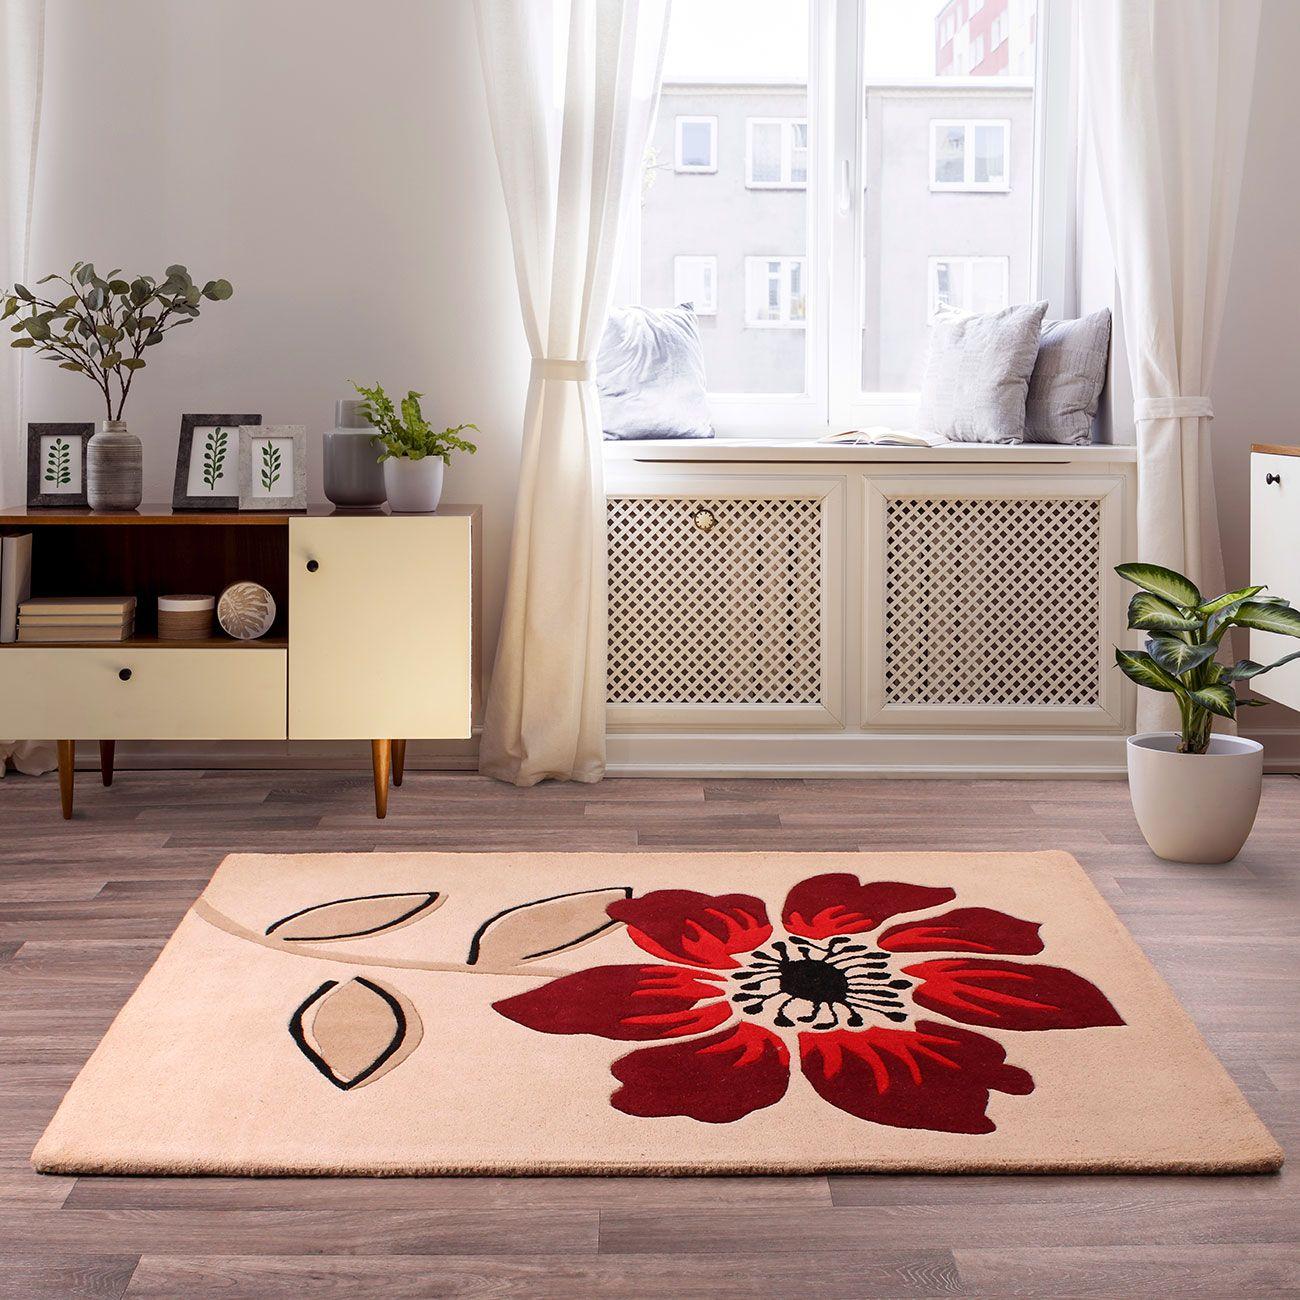 Floral Red Rug Wool Rug Therugshopuk